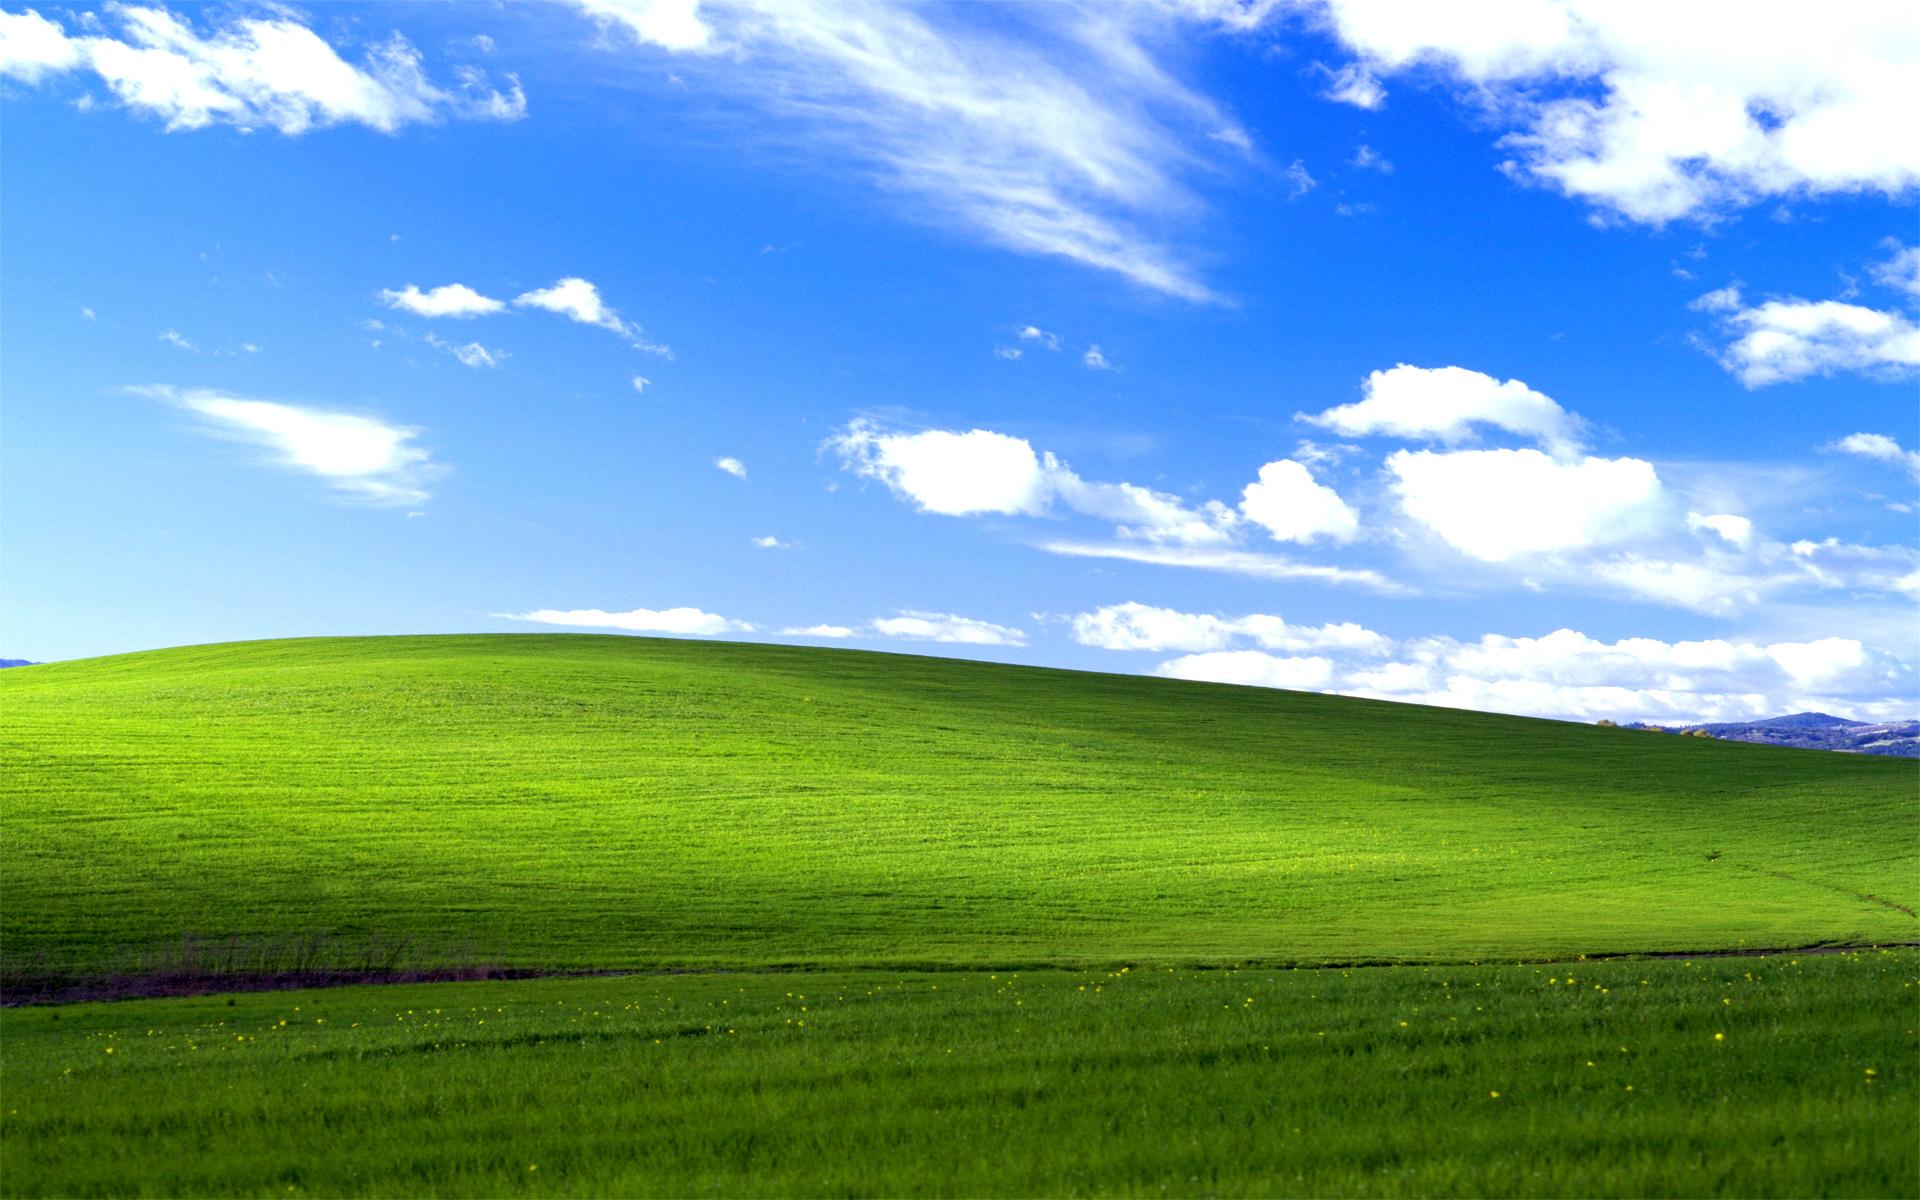 FIFA 14, Windows XP, Talking Angela: les 5 infos techno à retenir de ce mardi